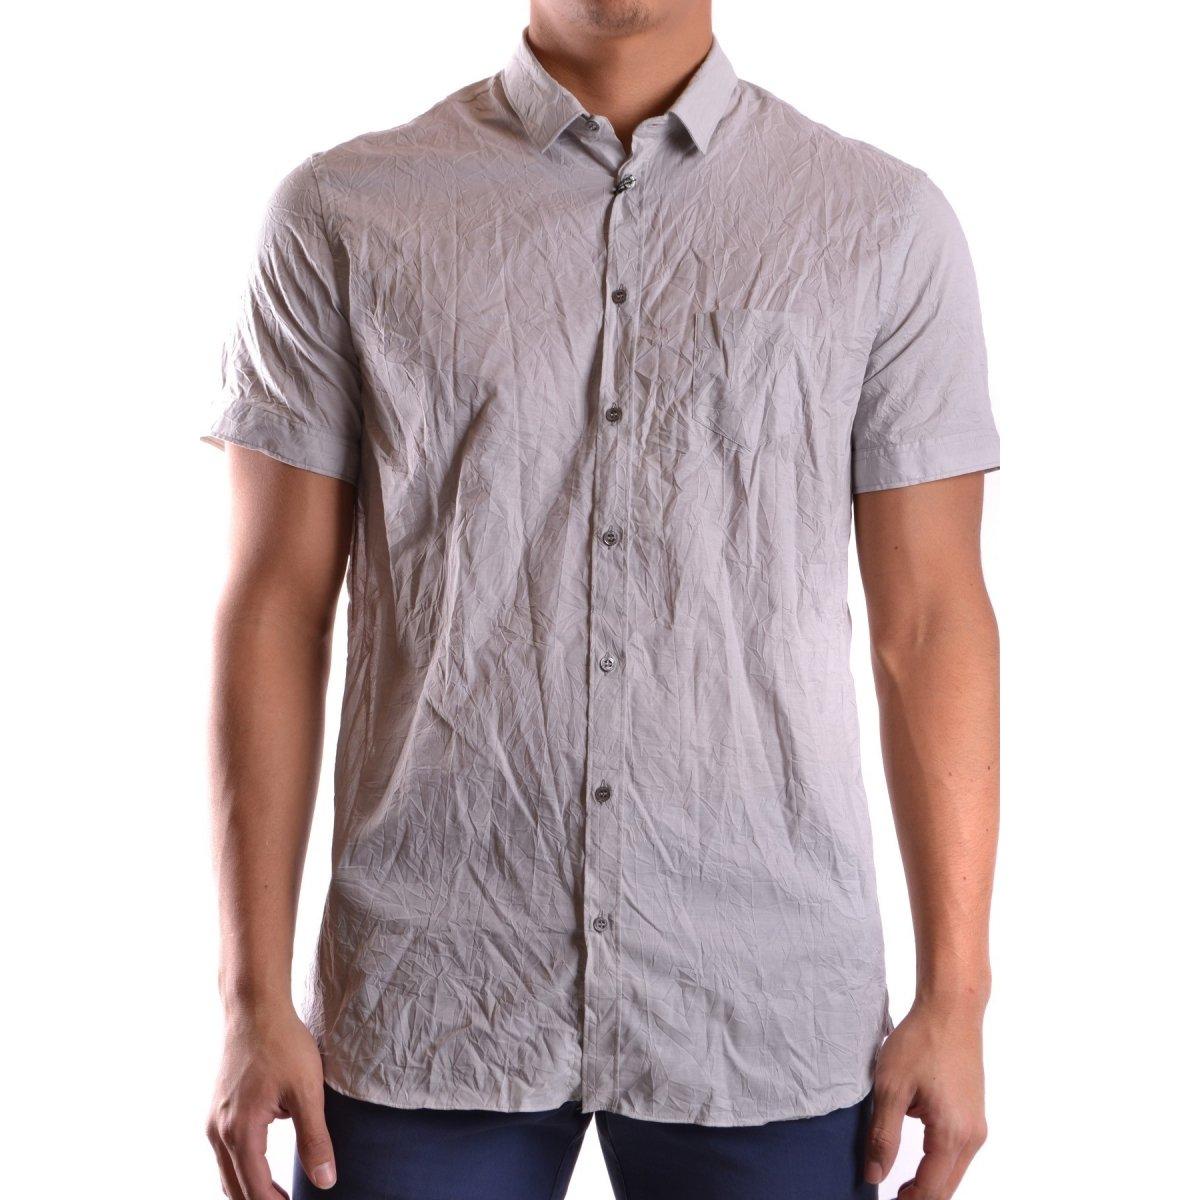 Neil Barrett Shirt PT3112 Gray